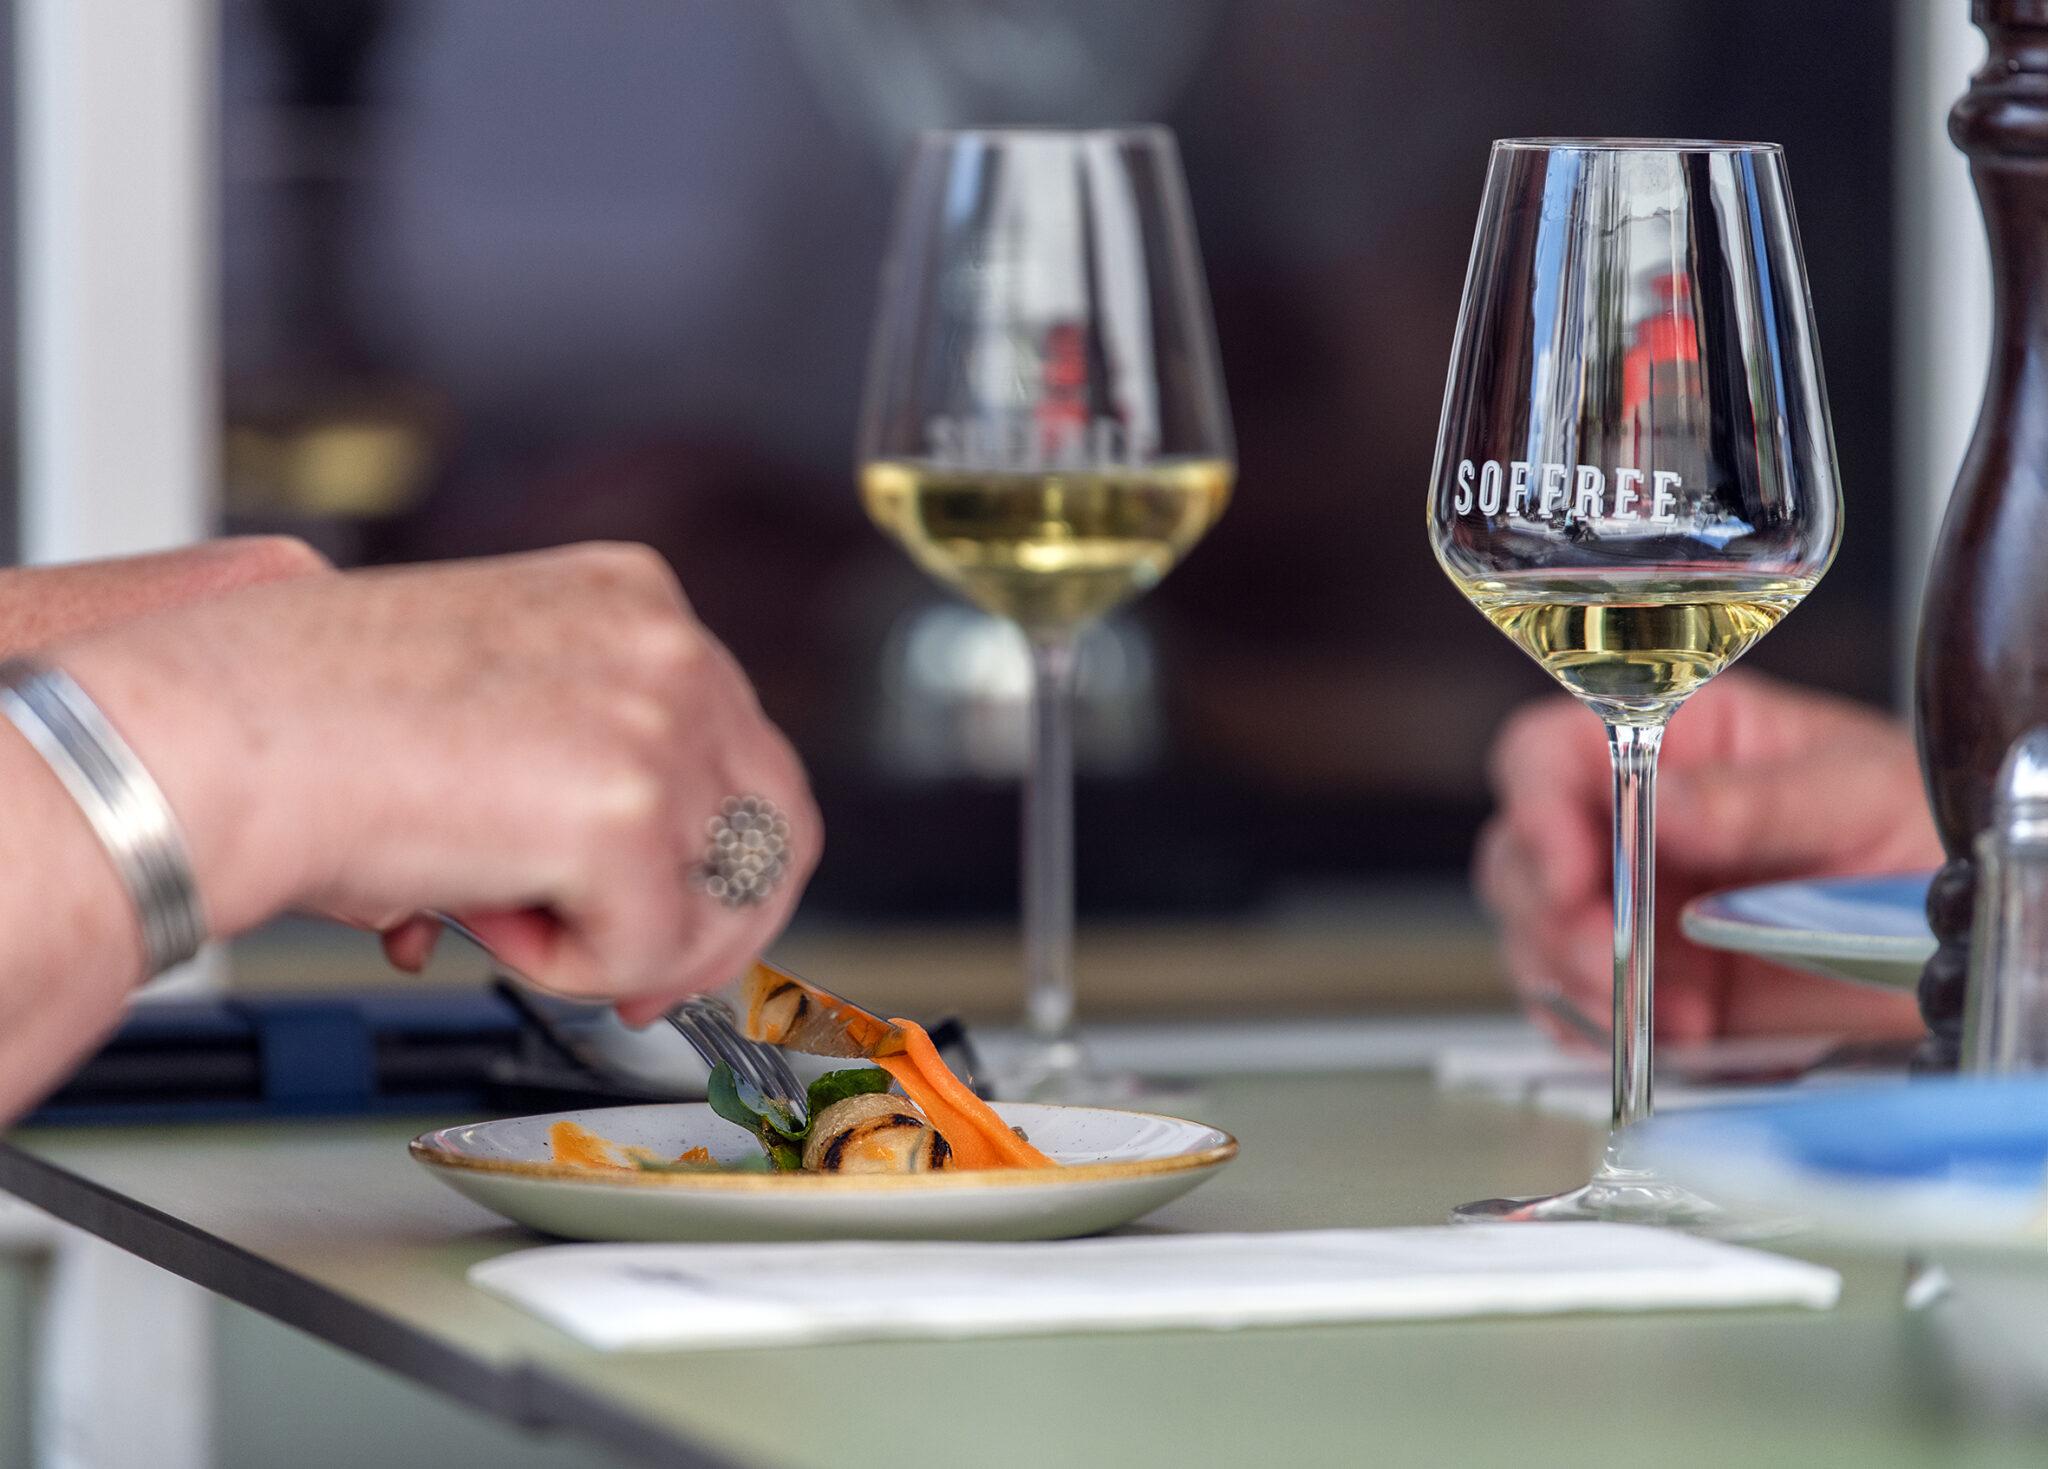 Soffree on Fifty-Four Oud-Beijerland shared dinner diner lunch Hoeksche Waard terras eten